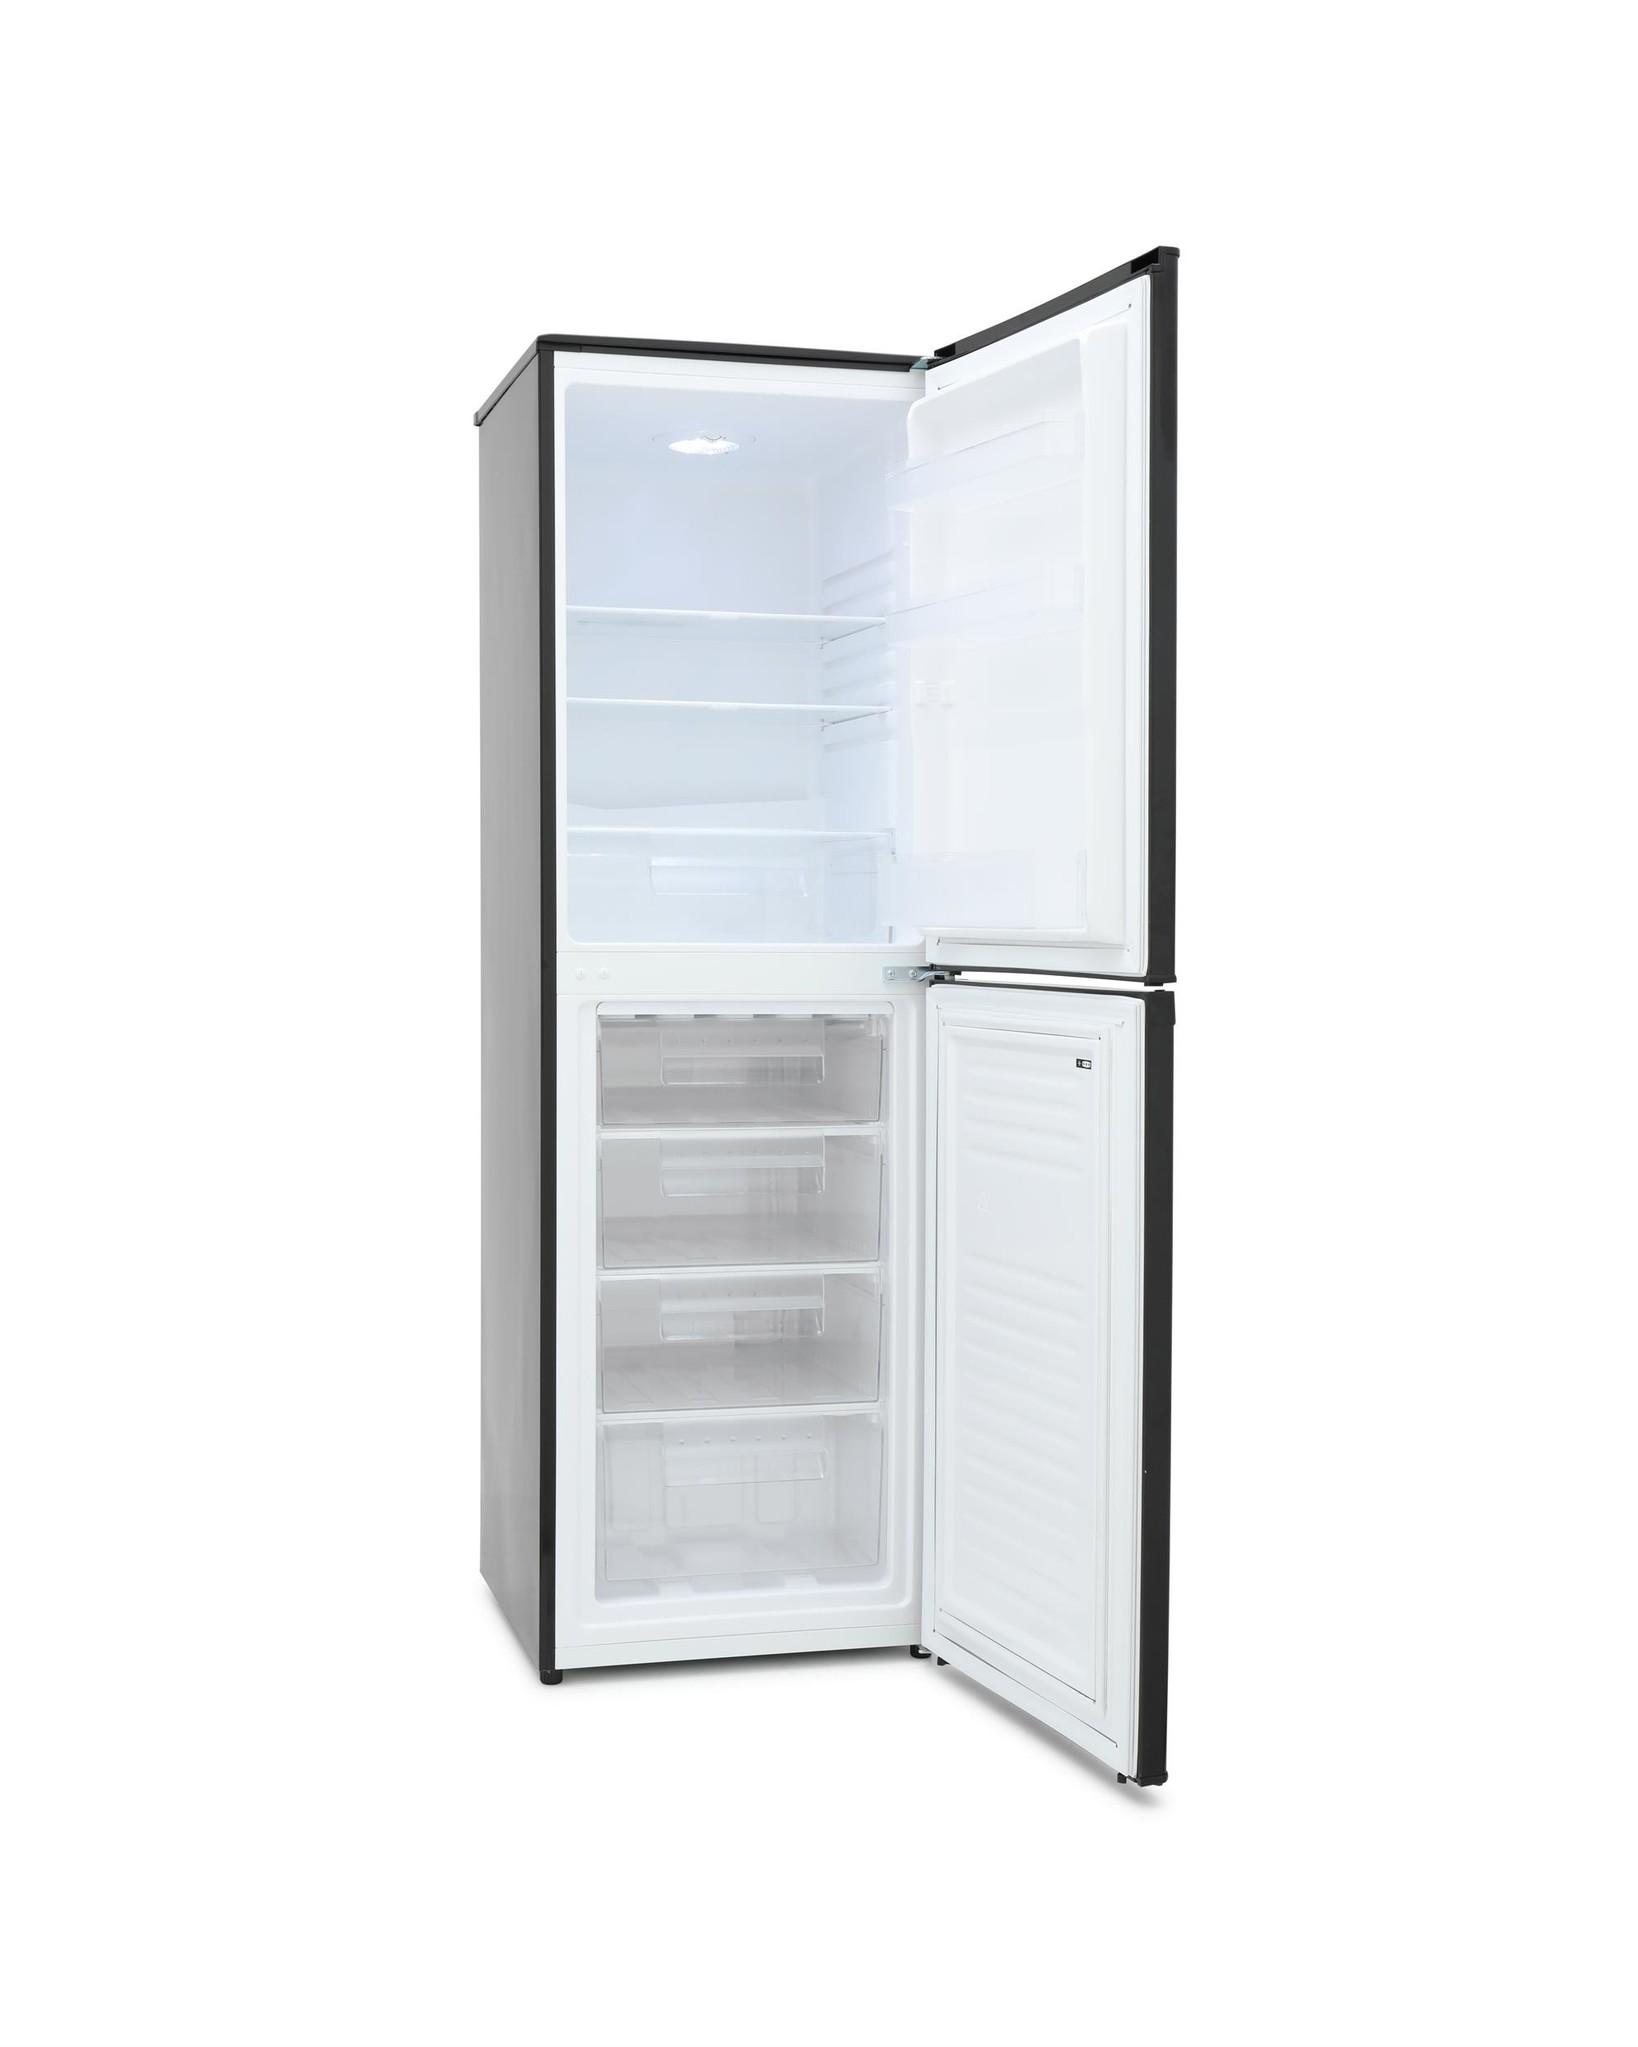 Montpellier Montpellier MS171BK Combi Fridge Freezer